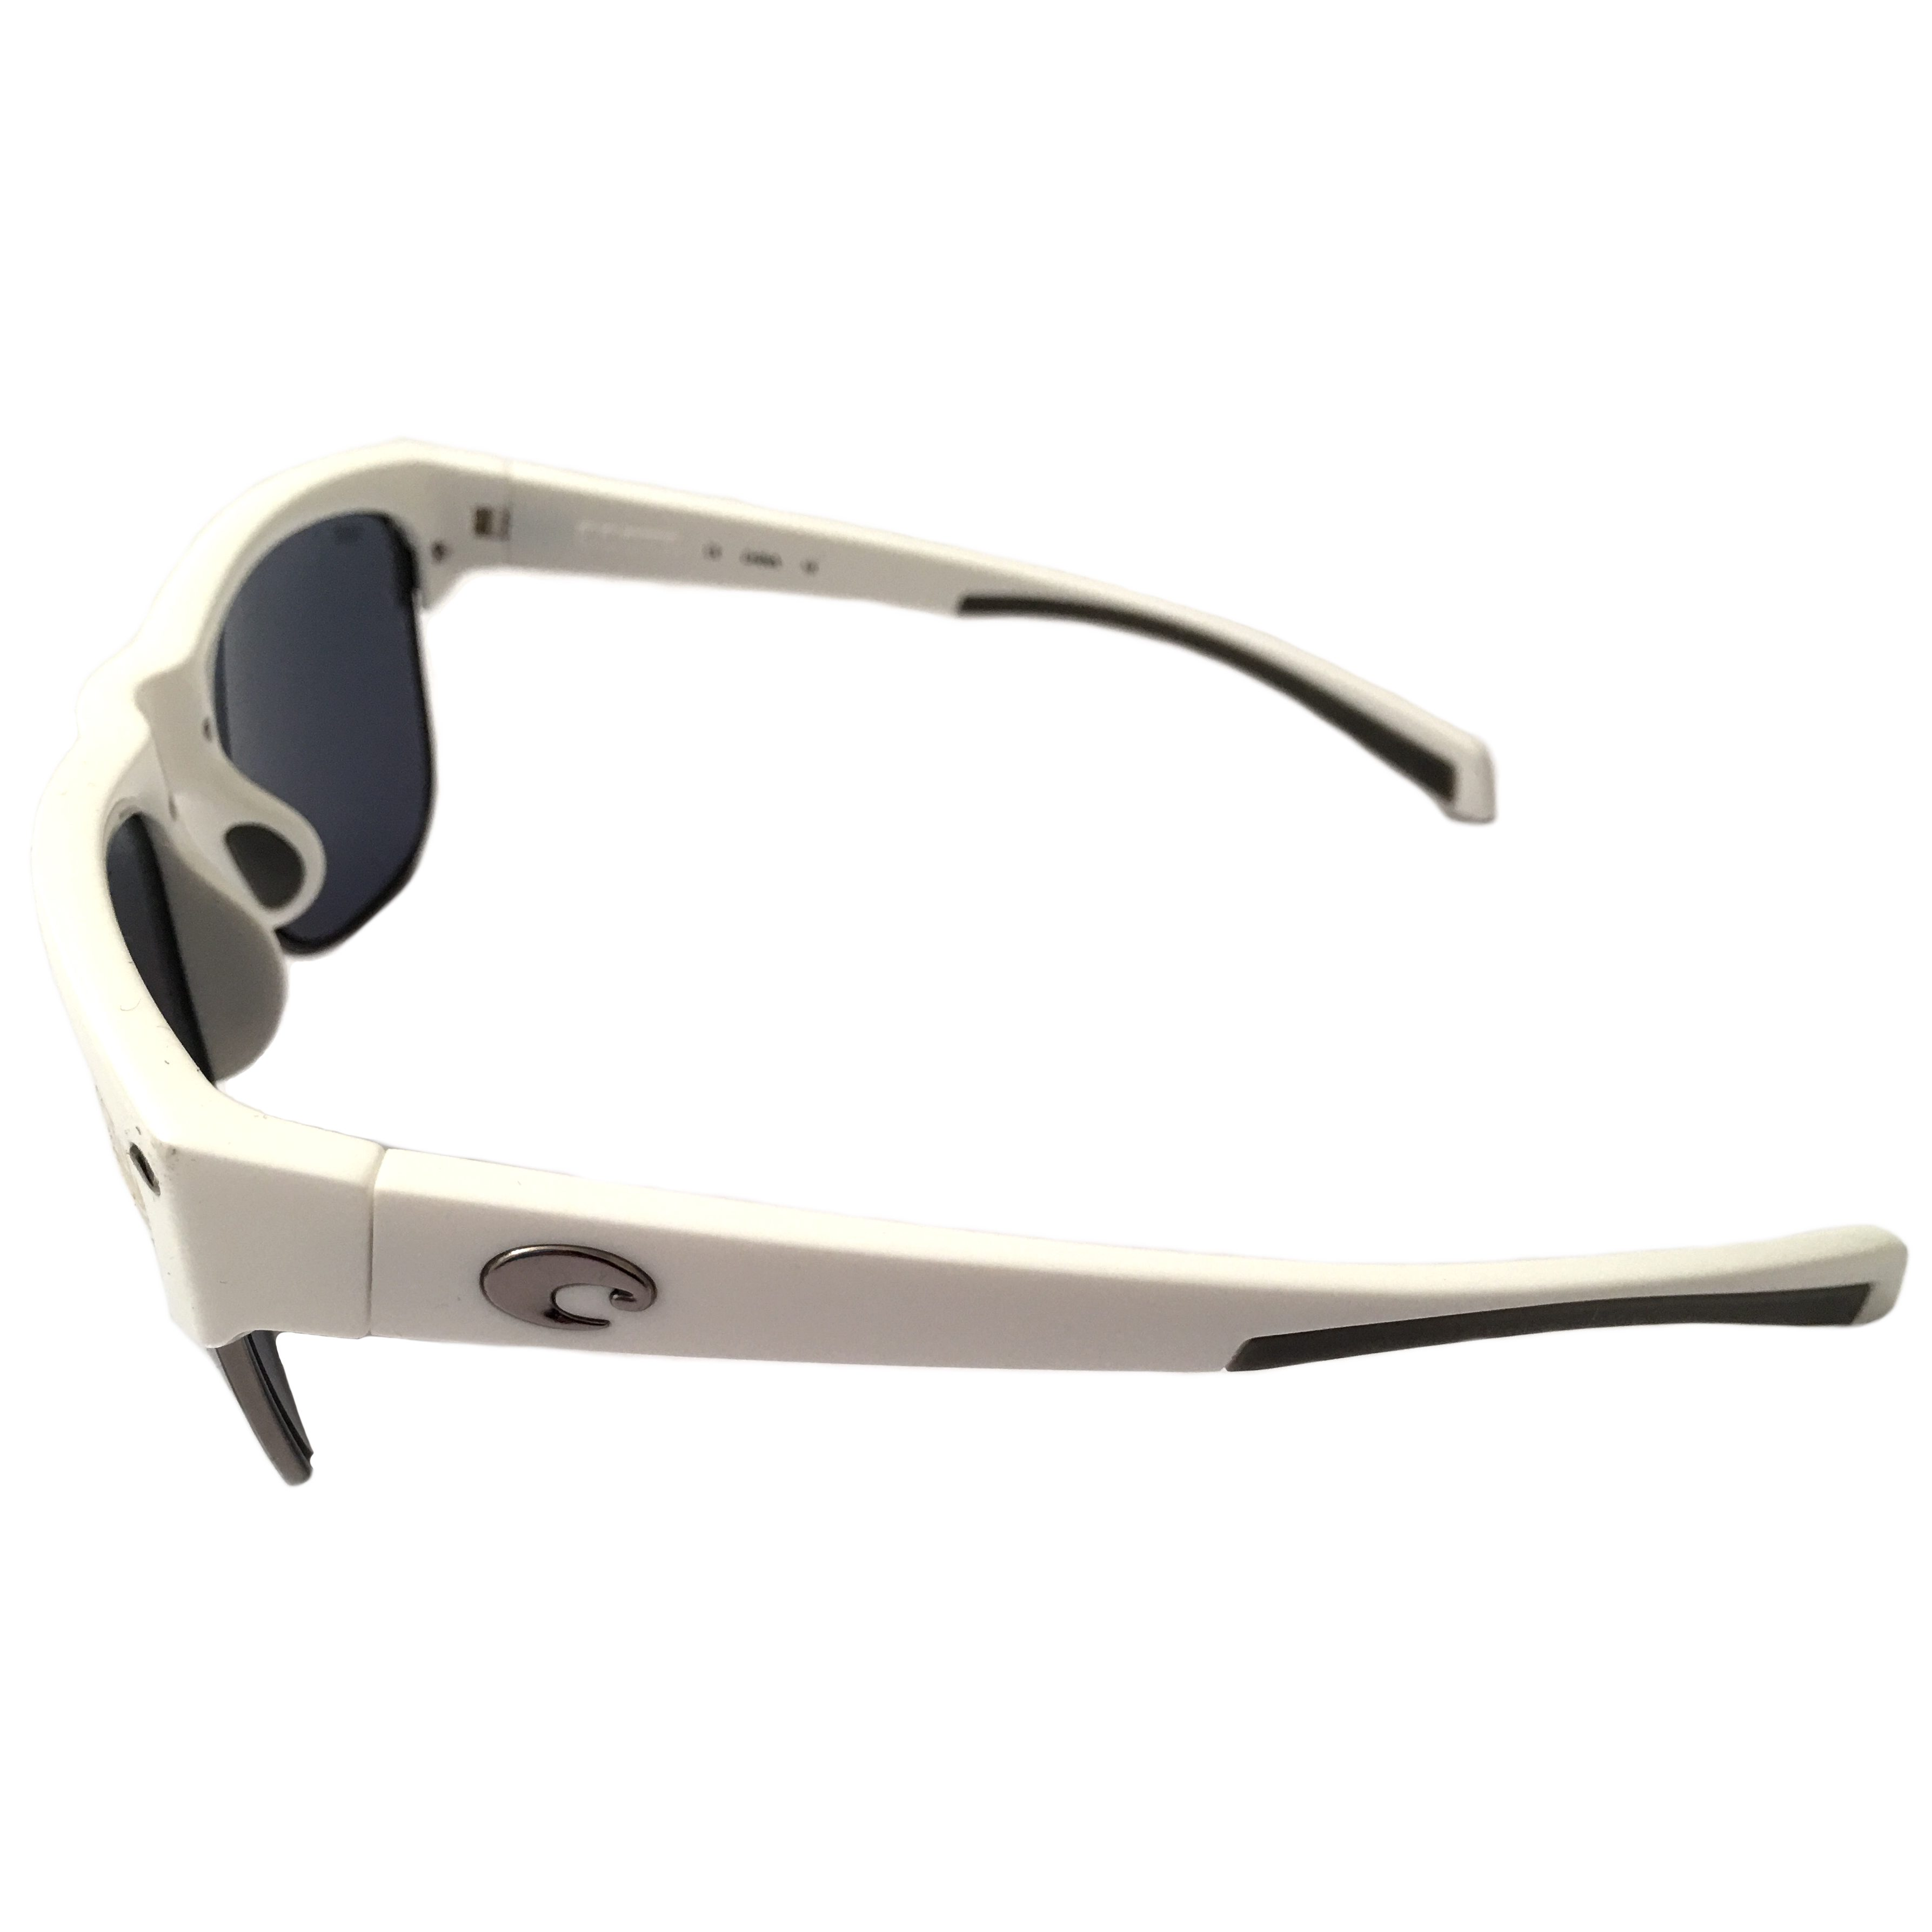 10525e80db87 Costa Del Mar Pawleys Sunglasses - White Frame - POLARIZED Gray 580P Lens